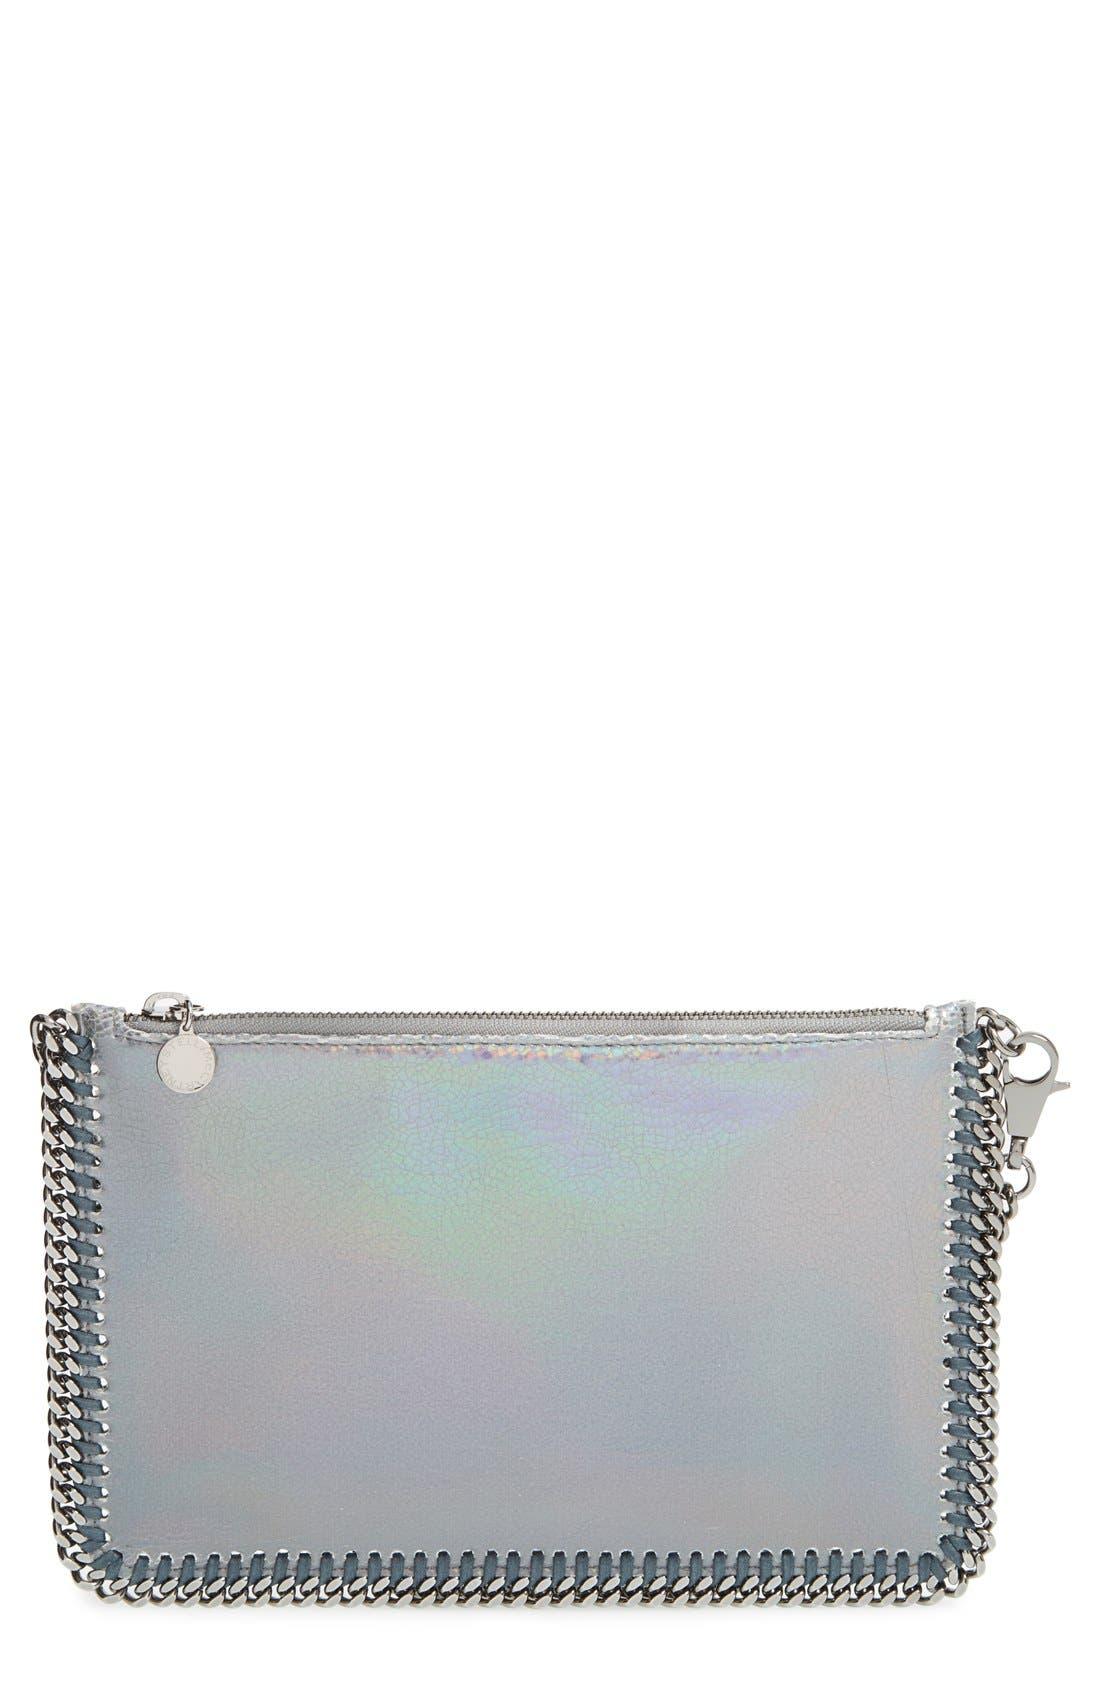 Main Image - Stella McCartney 'Falabella' Hologram Handbag